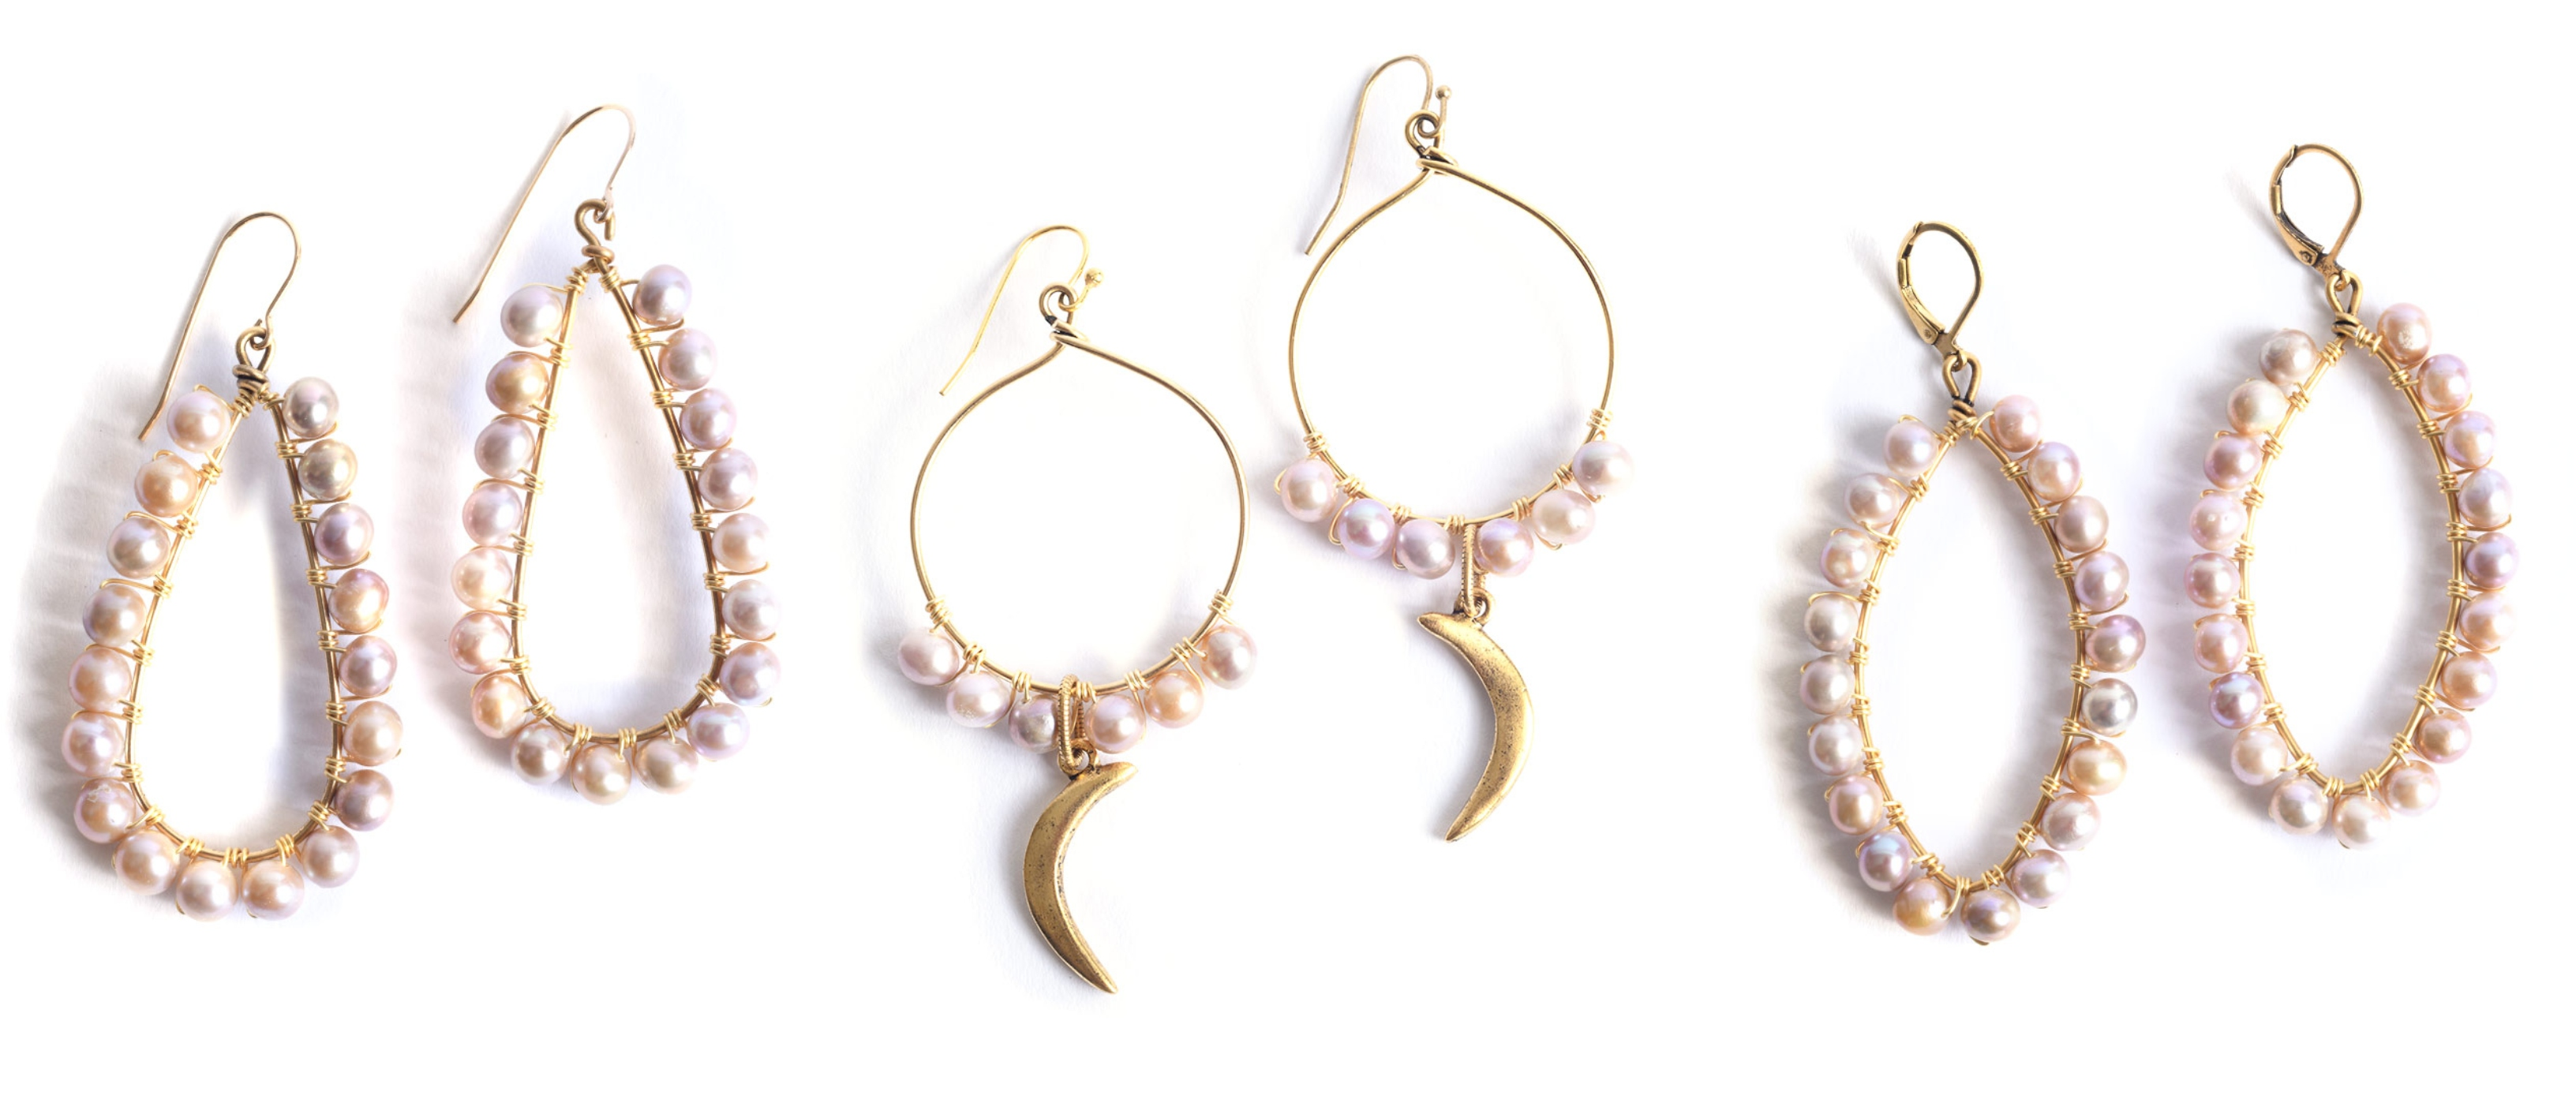 Wire-Wrapped Pearl Nunn Design Hoop Earrings